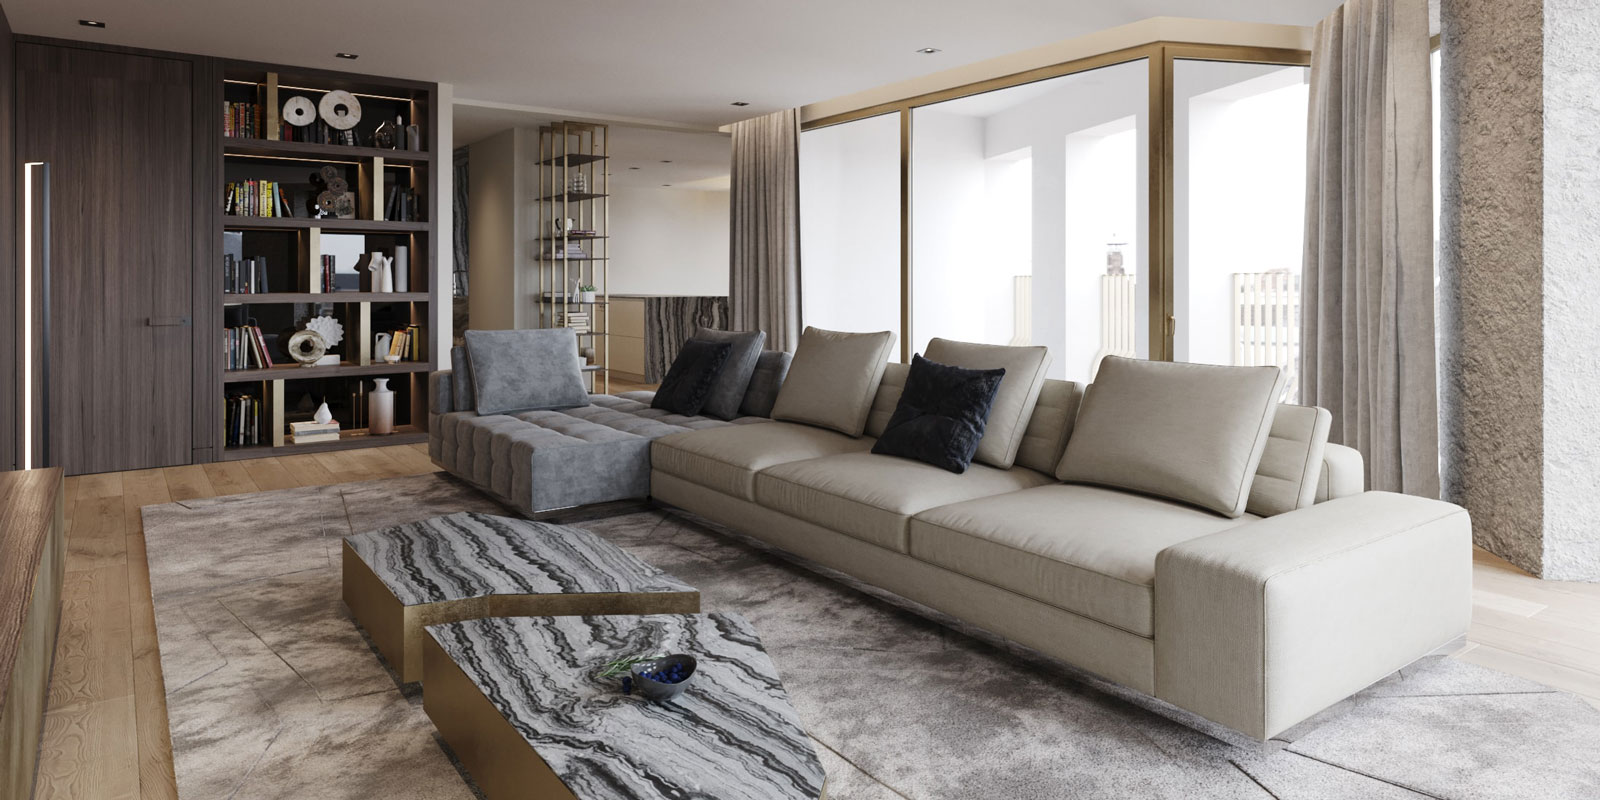 duin interior exclusief interieur interieur inrichting the art of living